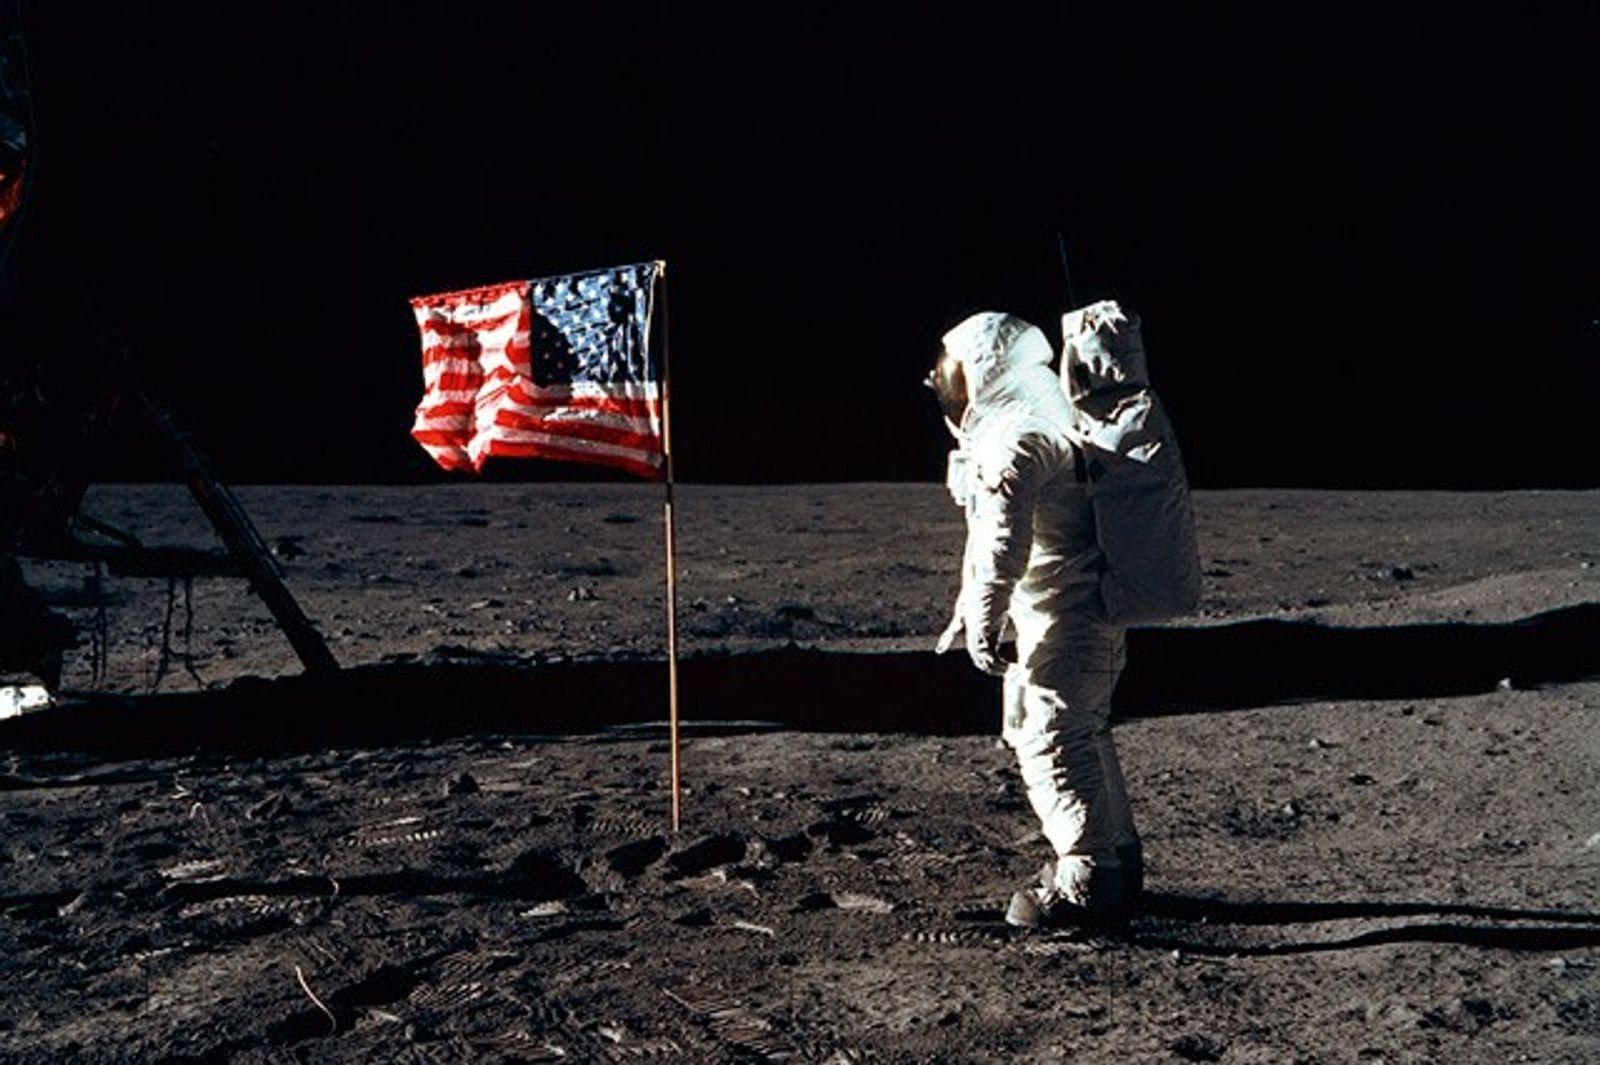 Moon landings: celebrating the Apollo II anniversary in 2019